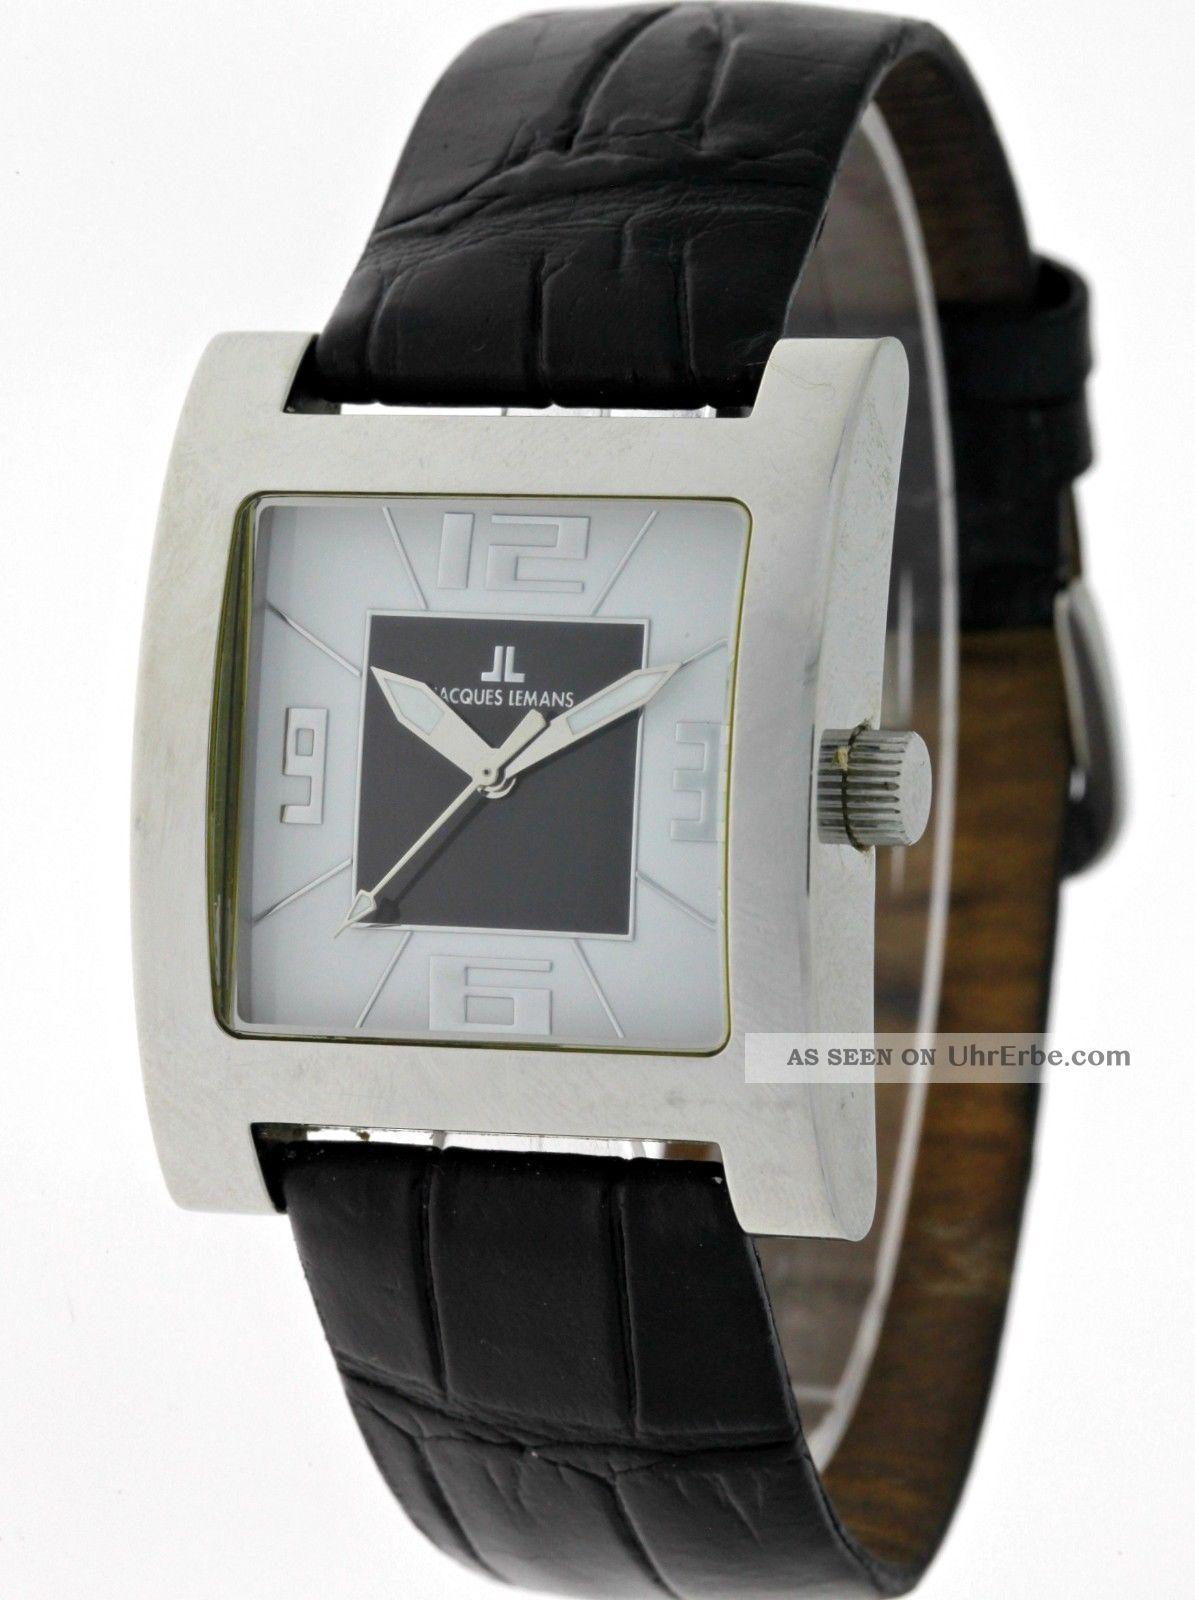 Sportliche Jacques Lemans Venice 1 - 1142 Grand Carre Quartz Damenuhr Edelstahl Armbanduhren Bild